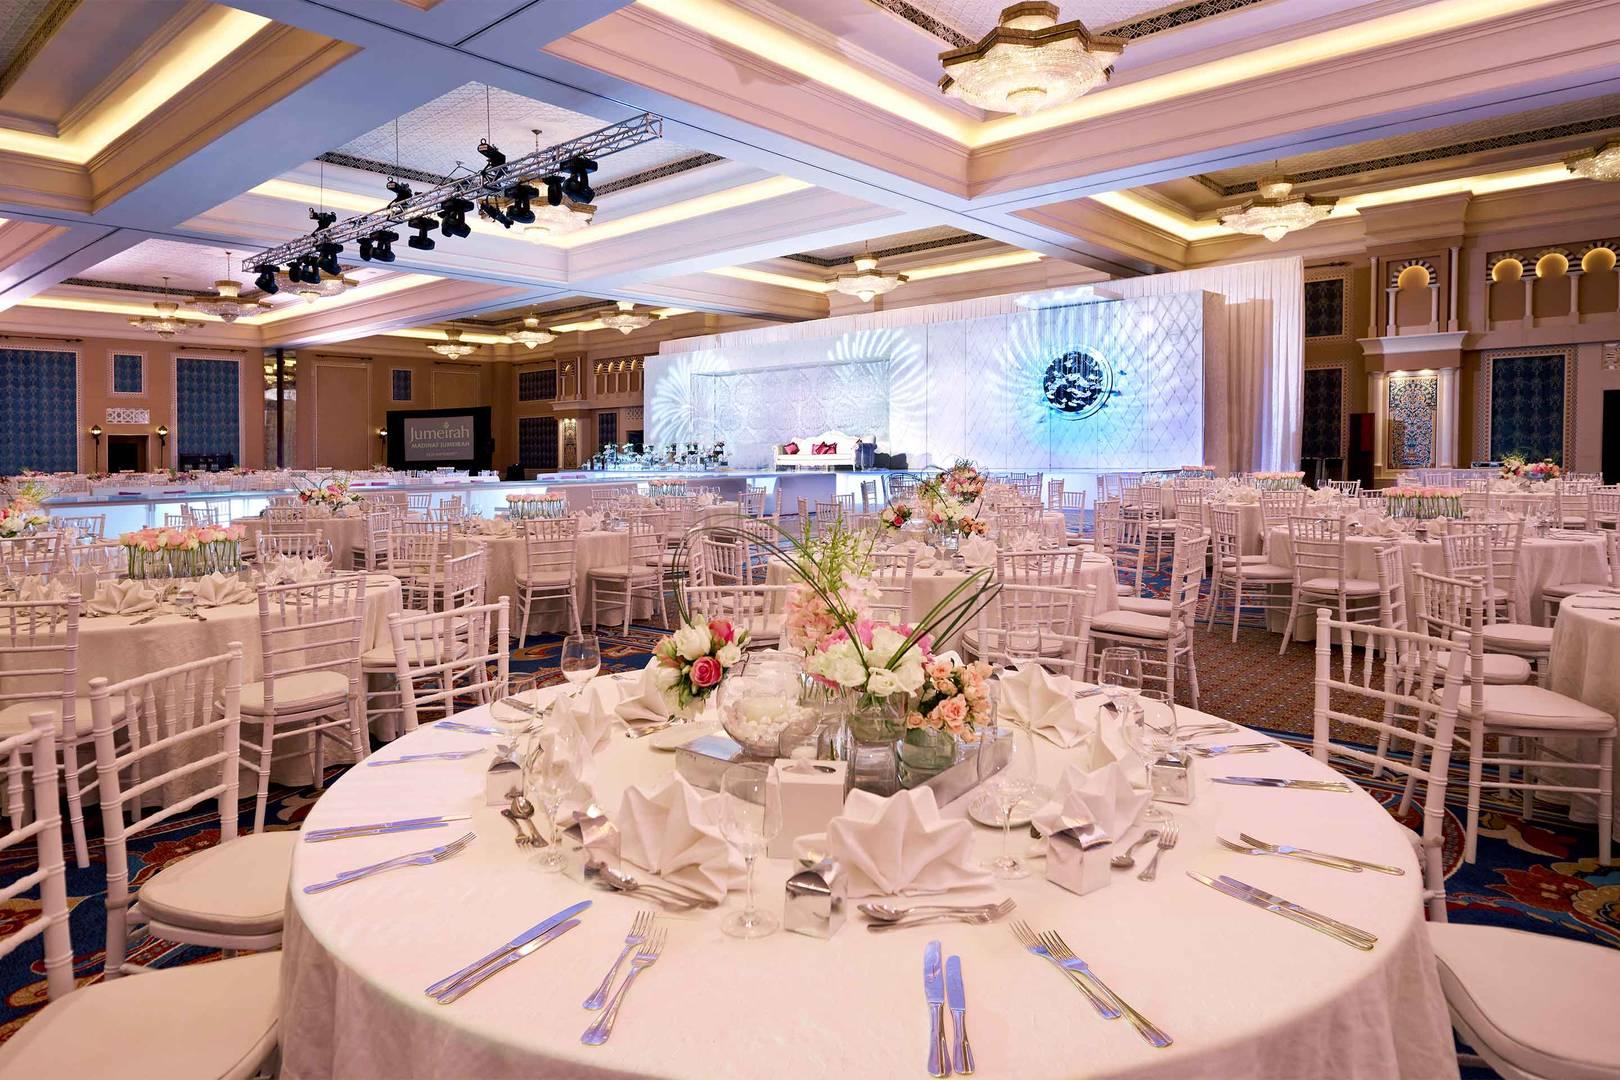 https://cdn.jumeirah.com/-/mediadh/DH/Hospitality/Jumeirah/Occasion/Dubai/Burj-Al-Arab/Al-Naseem-Al-Qasr-Dar-Al-Masyaf-A-Salam/Wedding/58_JoharahBallroomConferenceCentreMadinatJumeirahConferenceandEventsCentreJoharahBallroom.jpg?h=1080&w=1620&hash=5AC3D8D7A3BEDDEC5DA17EAF95E80201